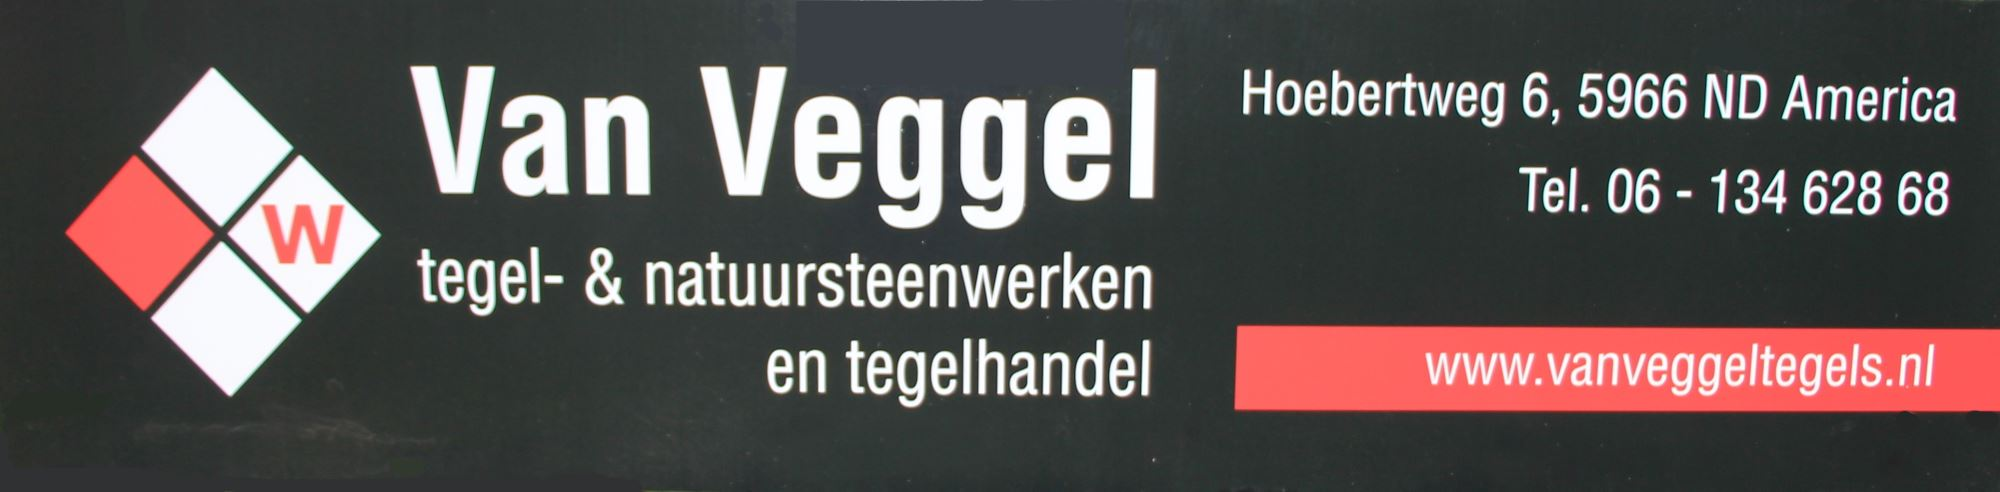 bord_vanVeggel